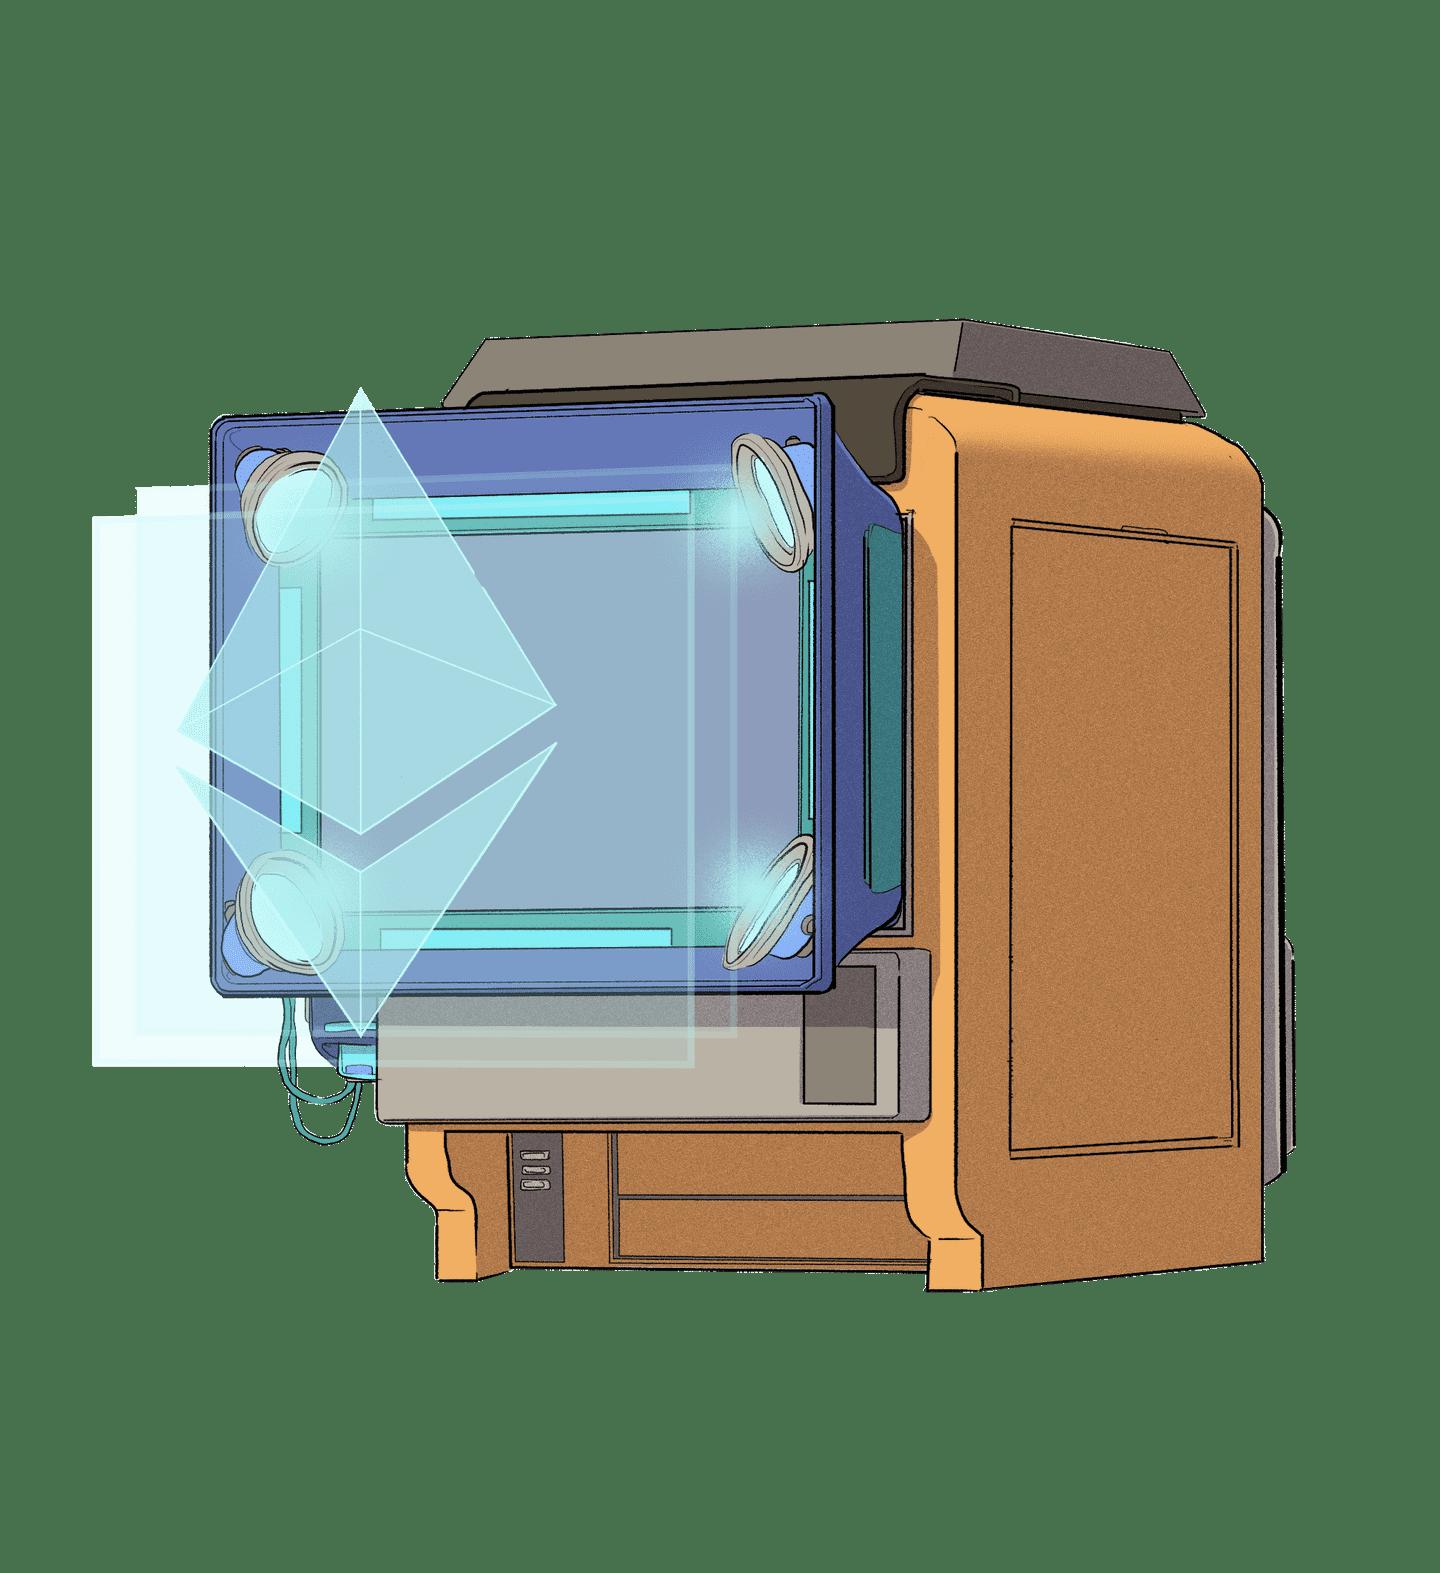 An Eth logo being displayed via hologram.